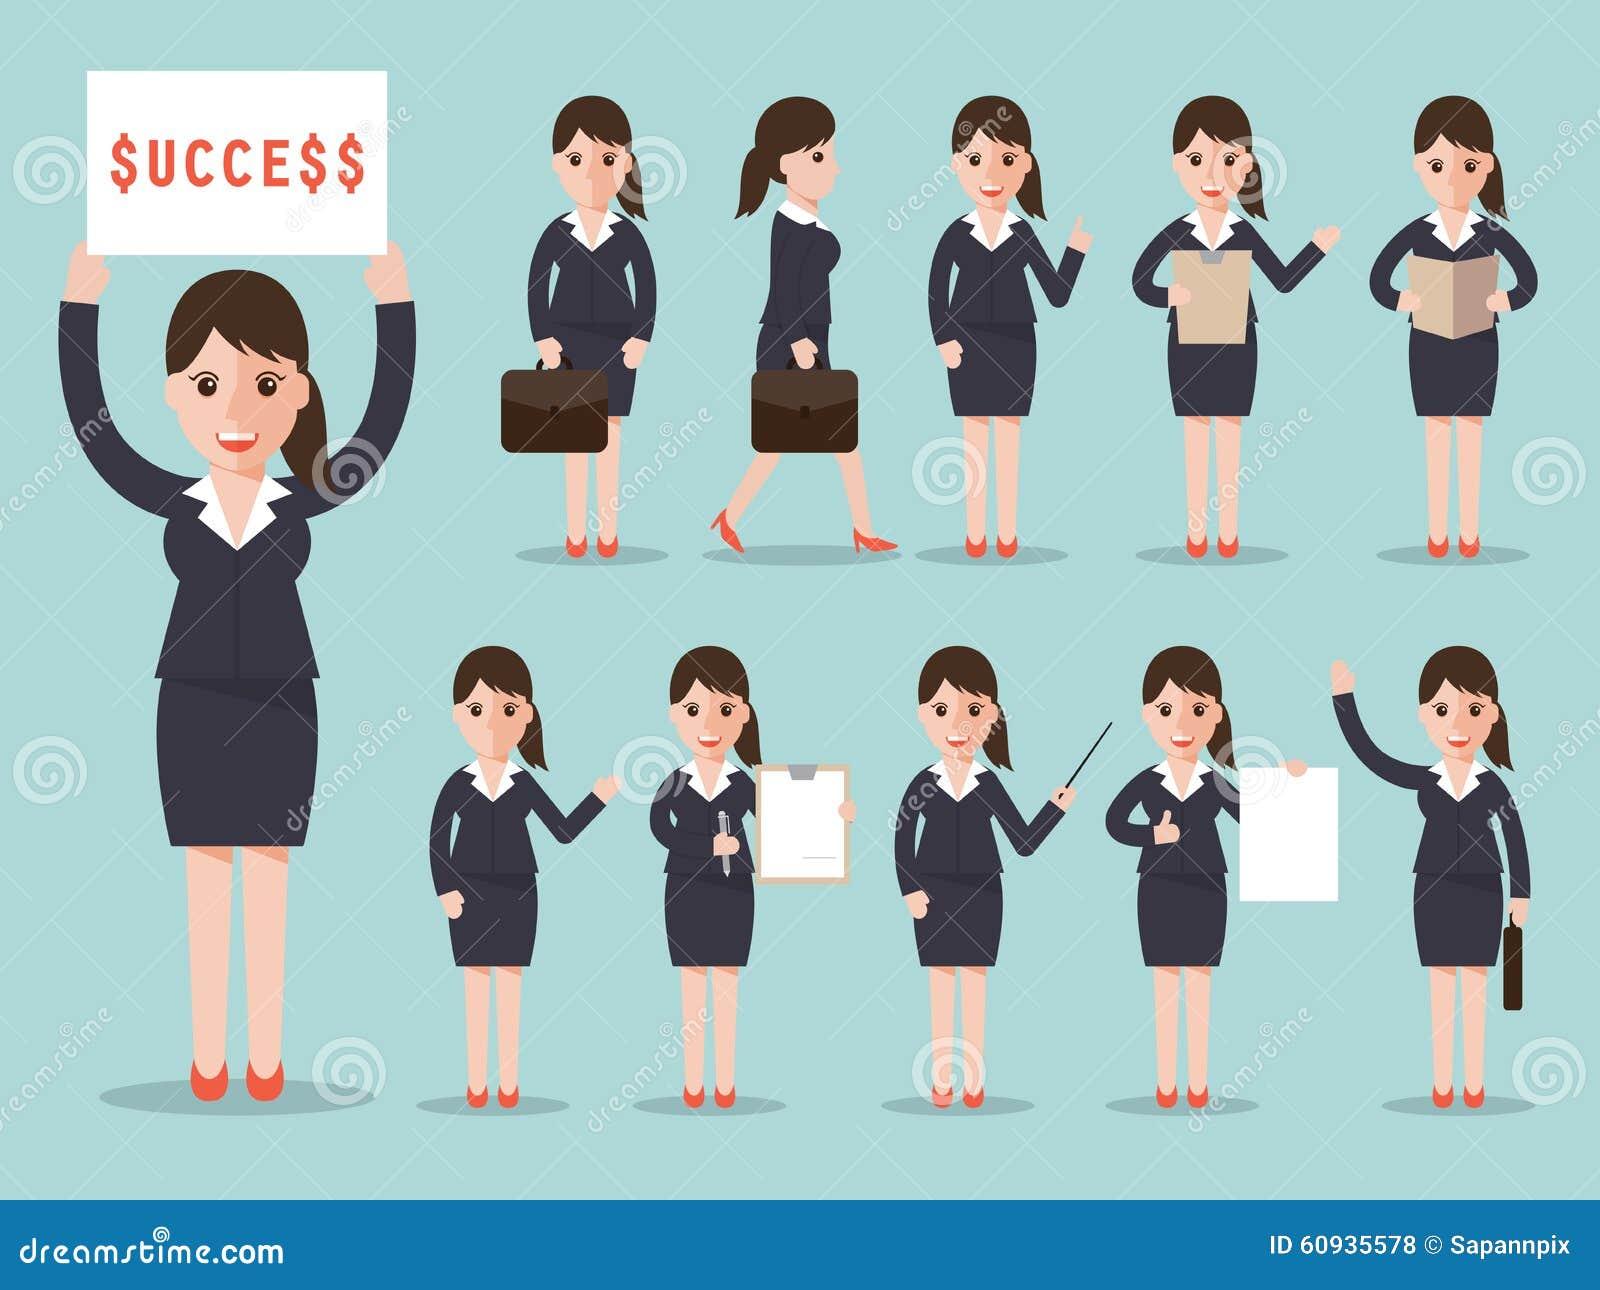 Character Design Set : Business woman character set stock vector image